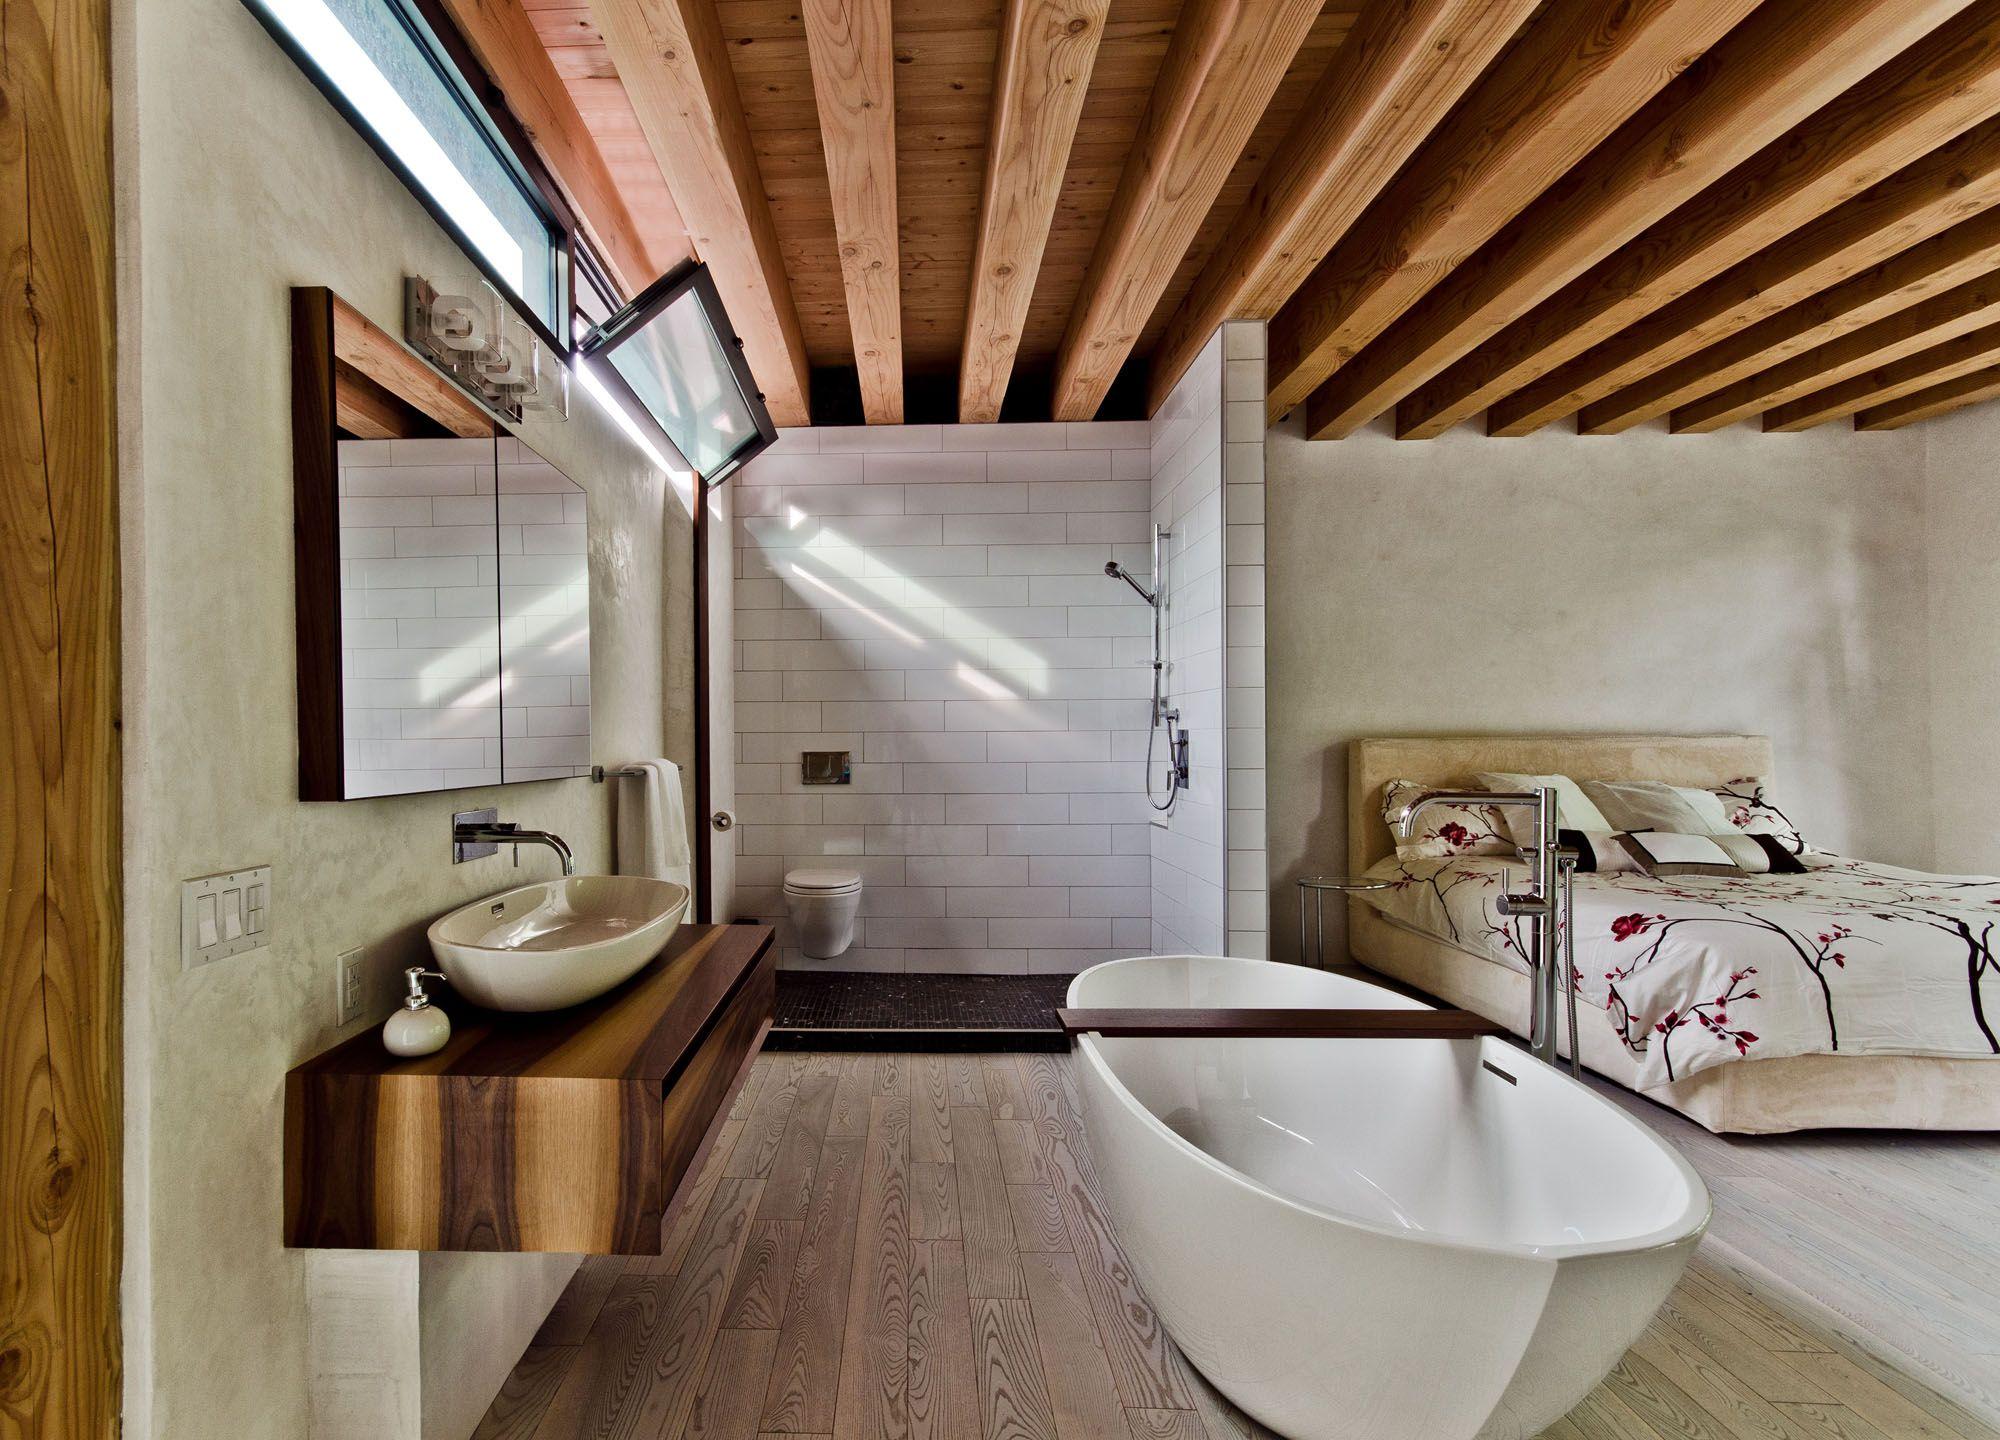 Ecologia Montreal By Gervais Fortin 21 Homedsgn Basement Bathroom Design Open Bathroom Bathroom Interior Design